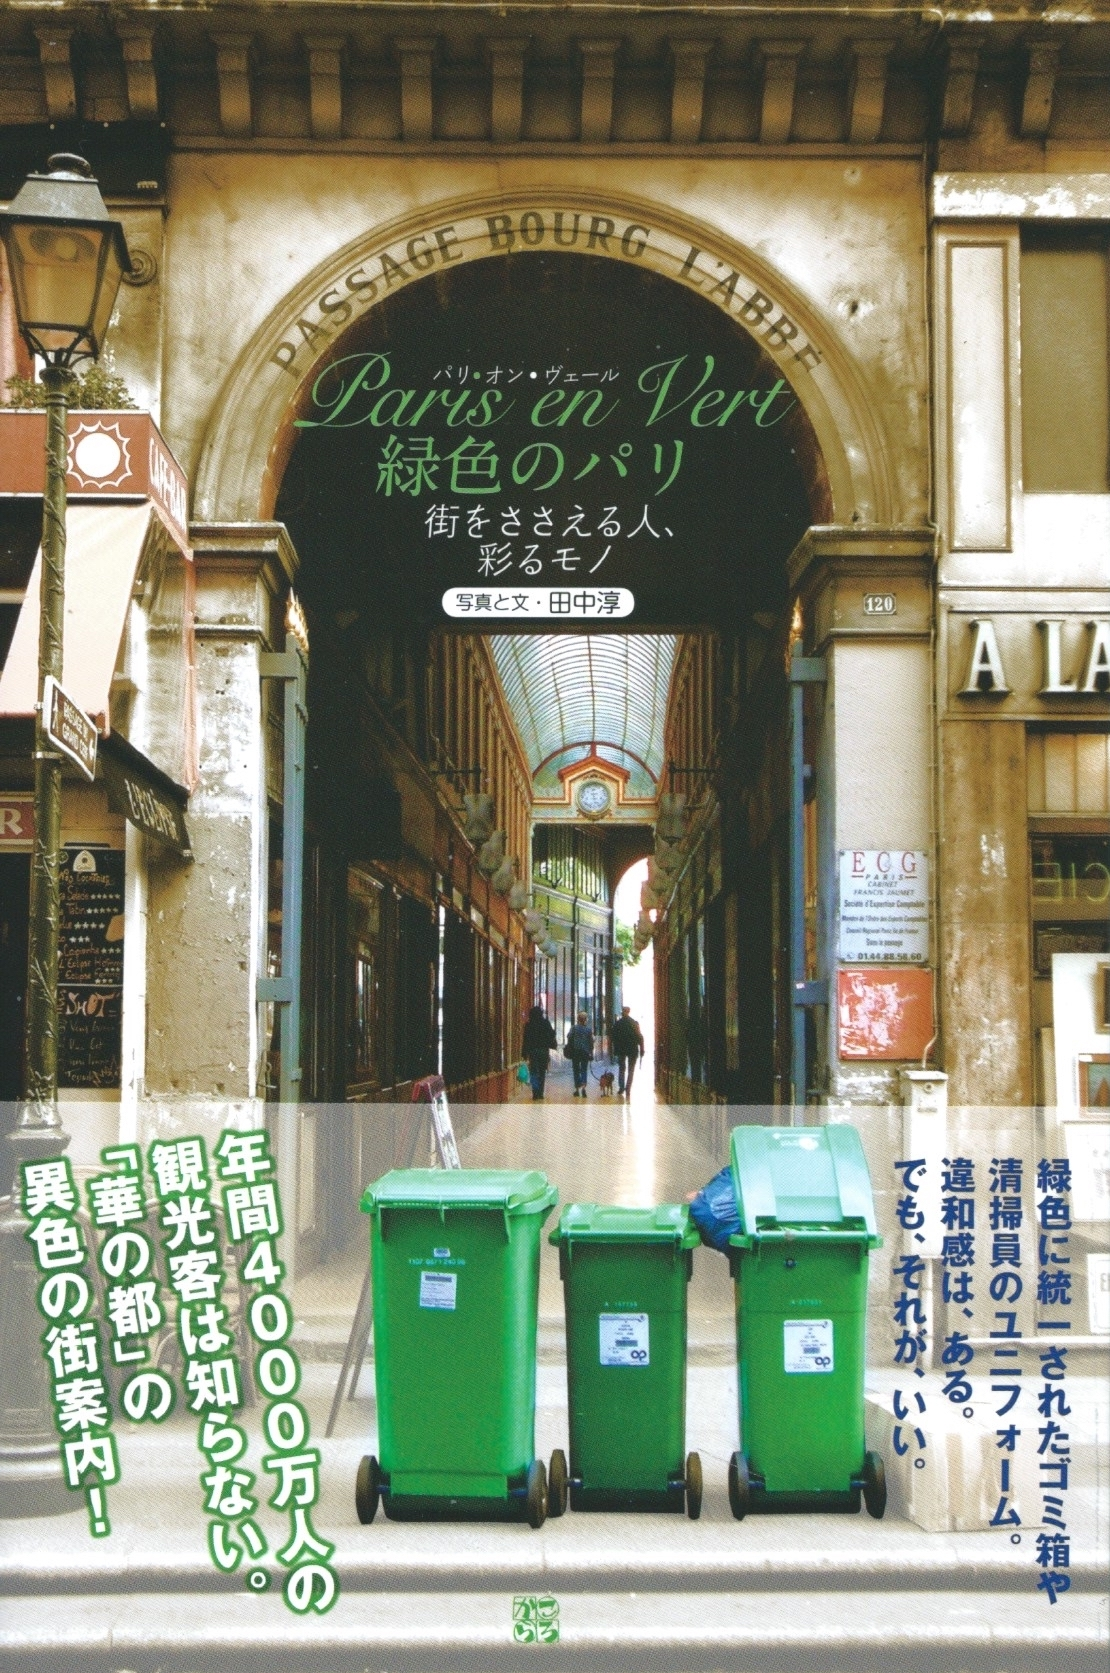 Paris en Vert 緑色のパリ——街をささえる人、彩るモノ